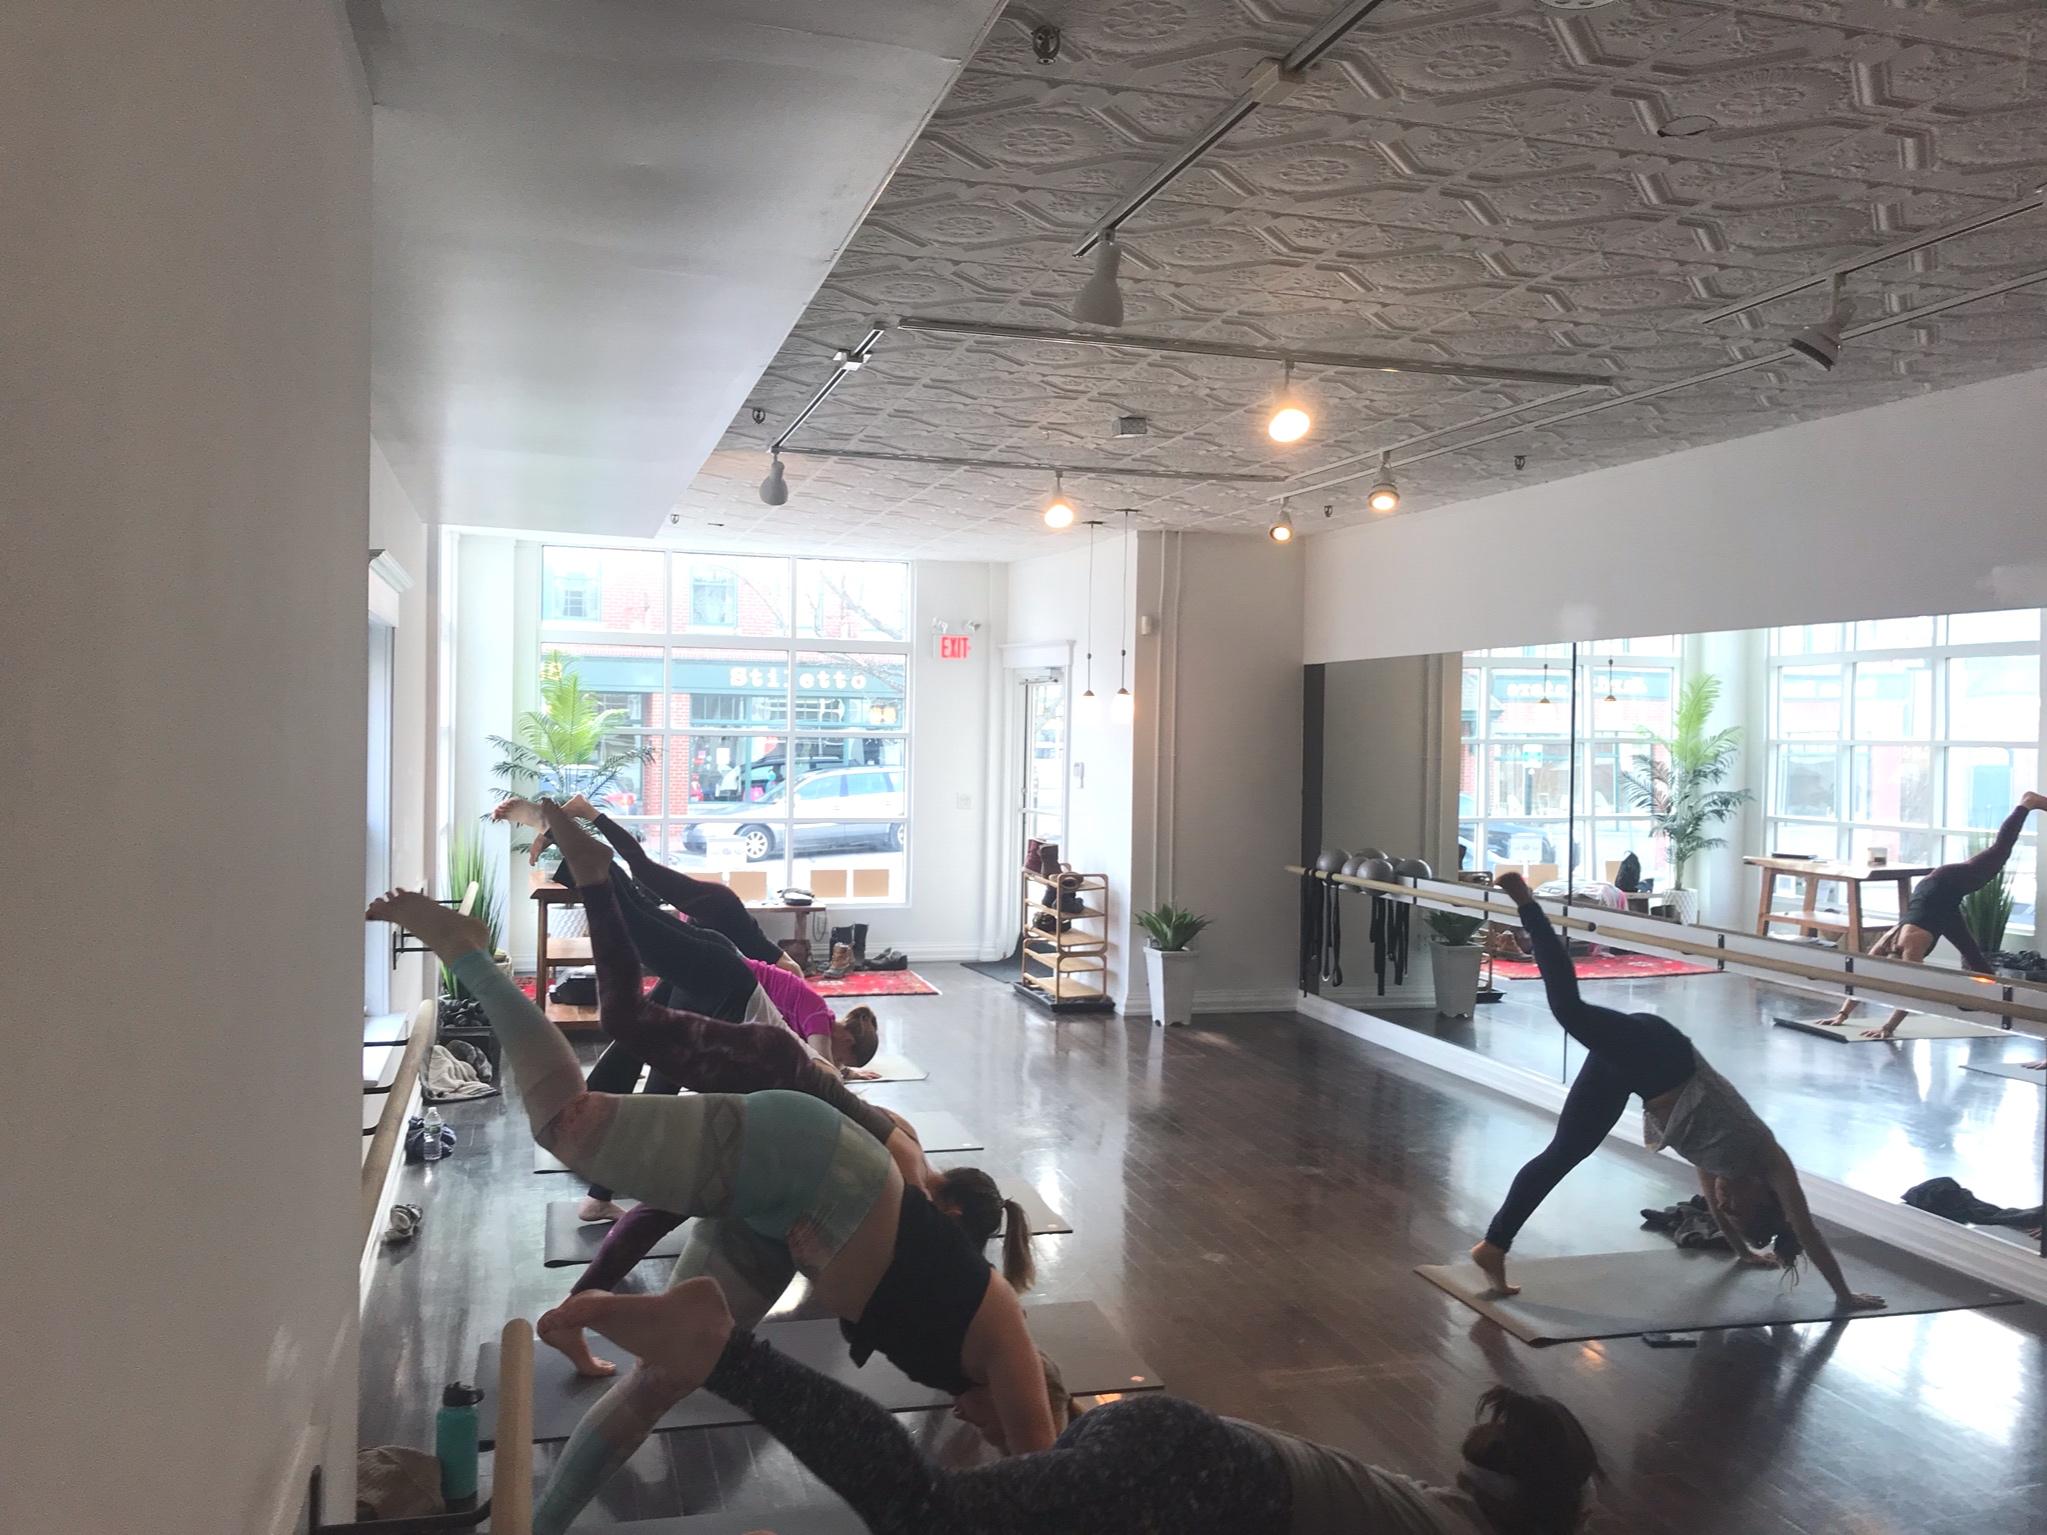 BUTI - a yoga dance party!